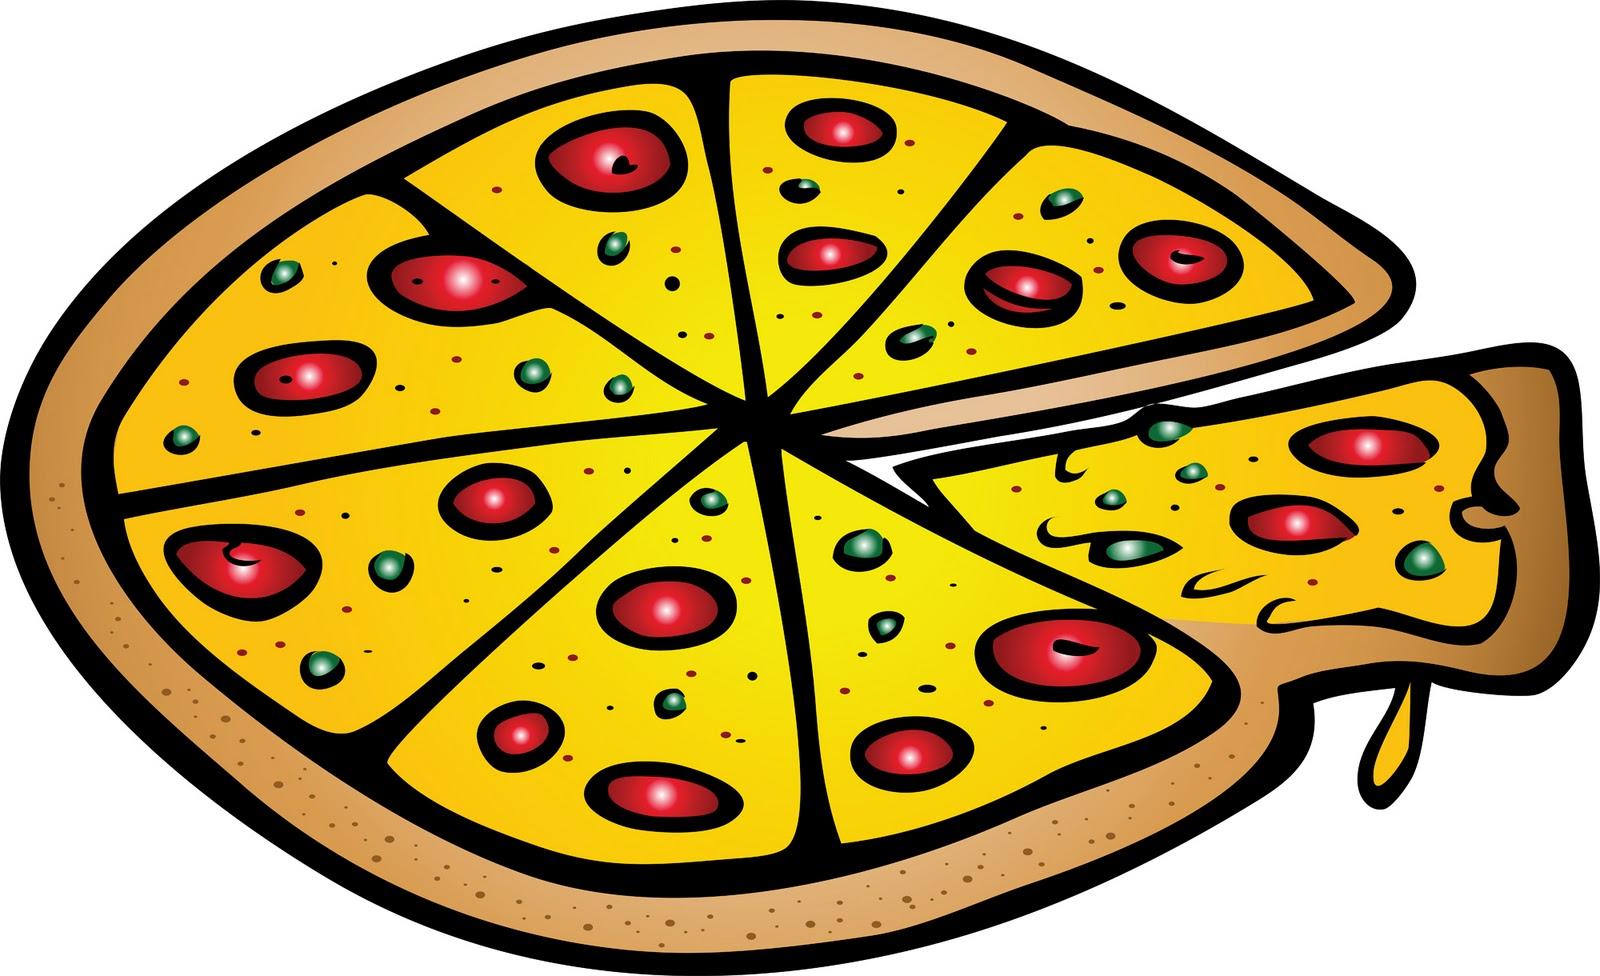 Pizza clip art - Cliparting clipartall.com